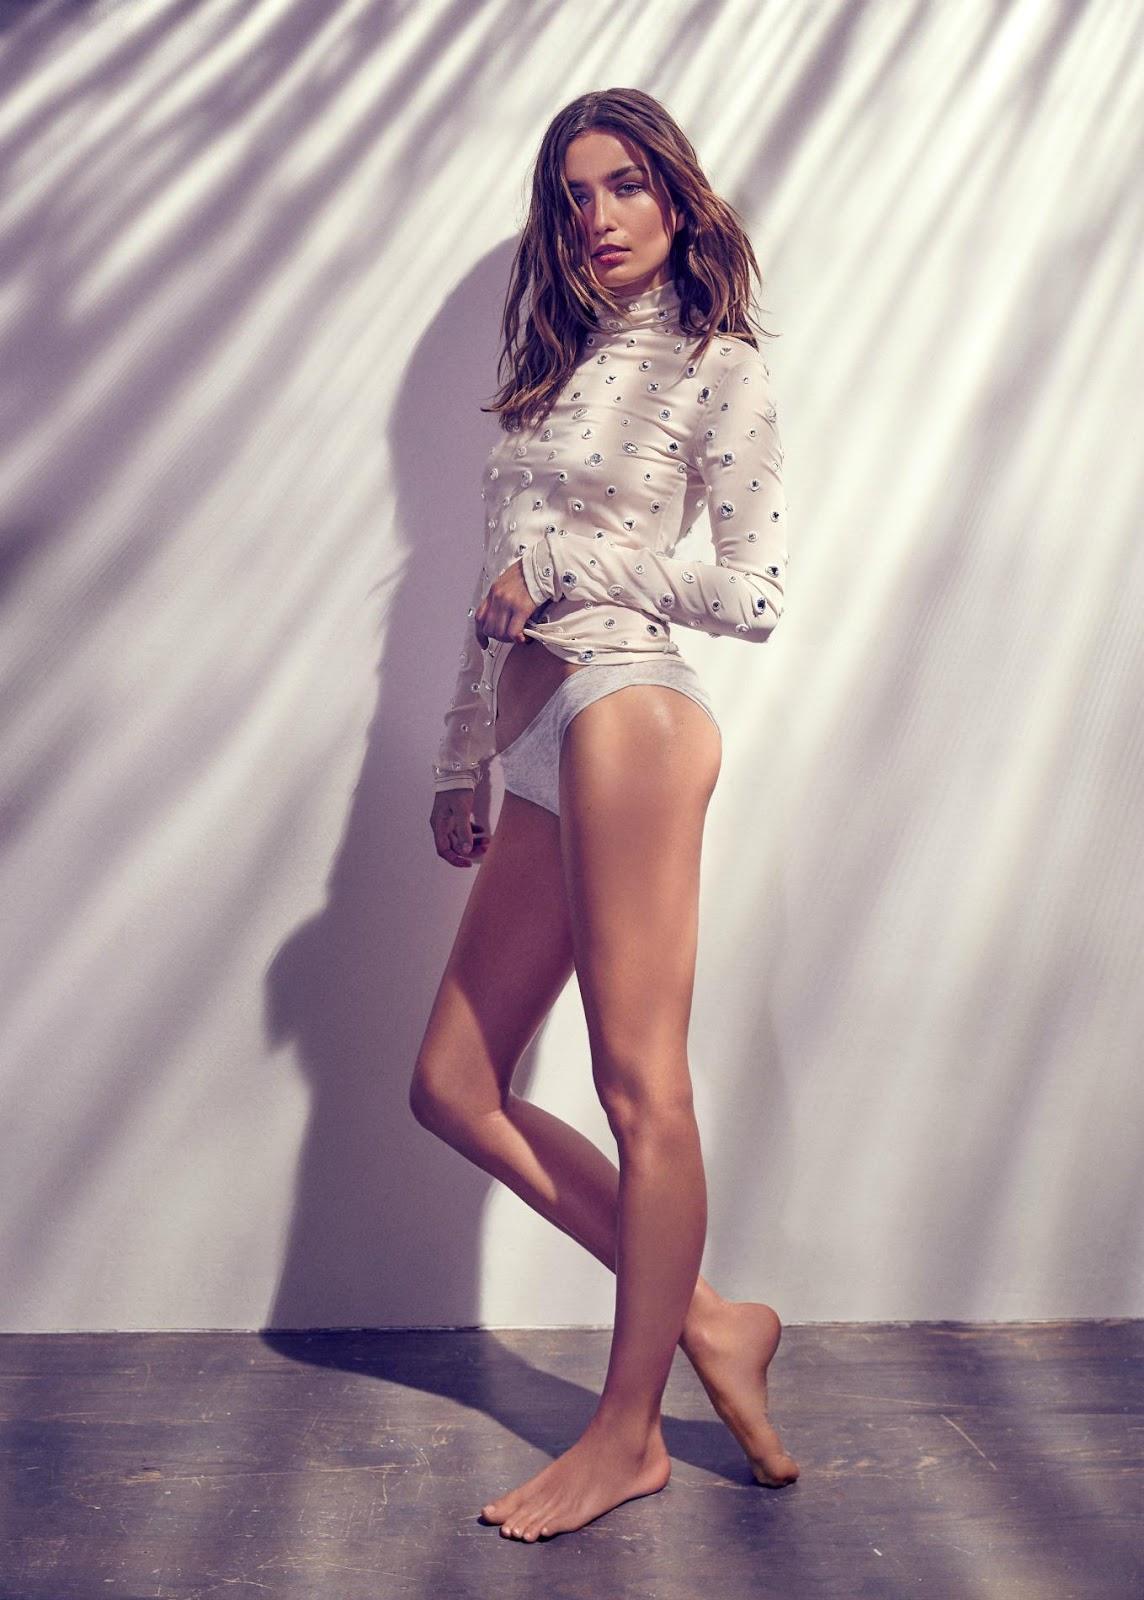 2017 05 kayla autumn ward legs - Make Up Lili Choi